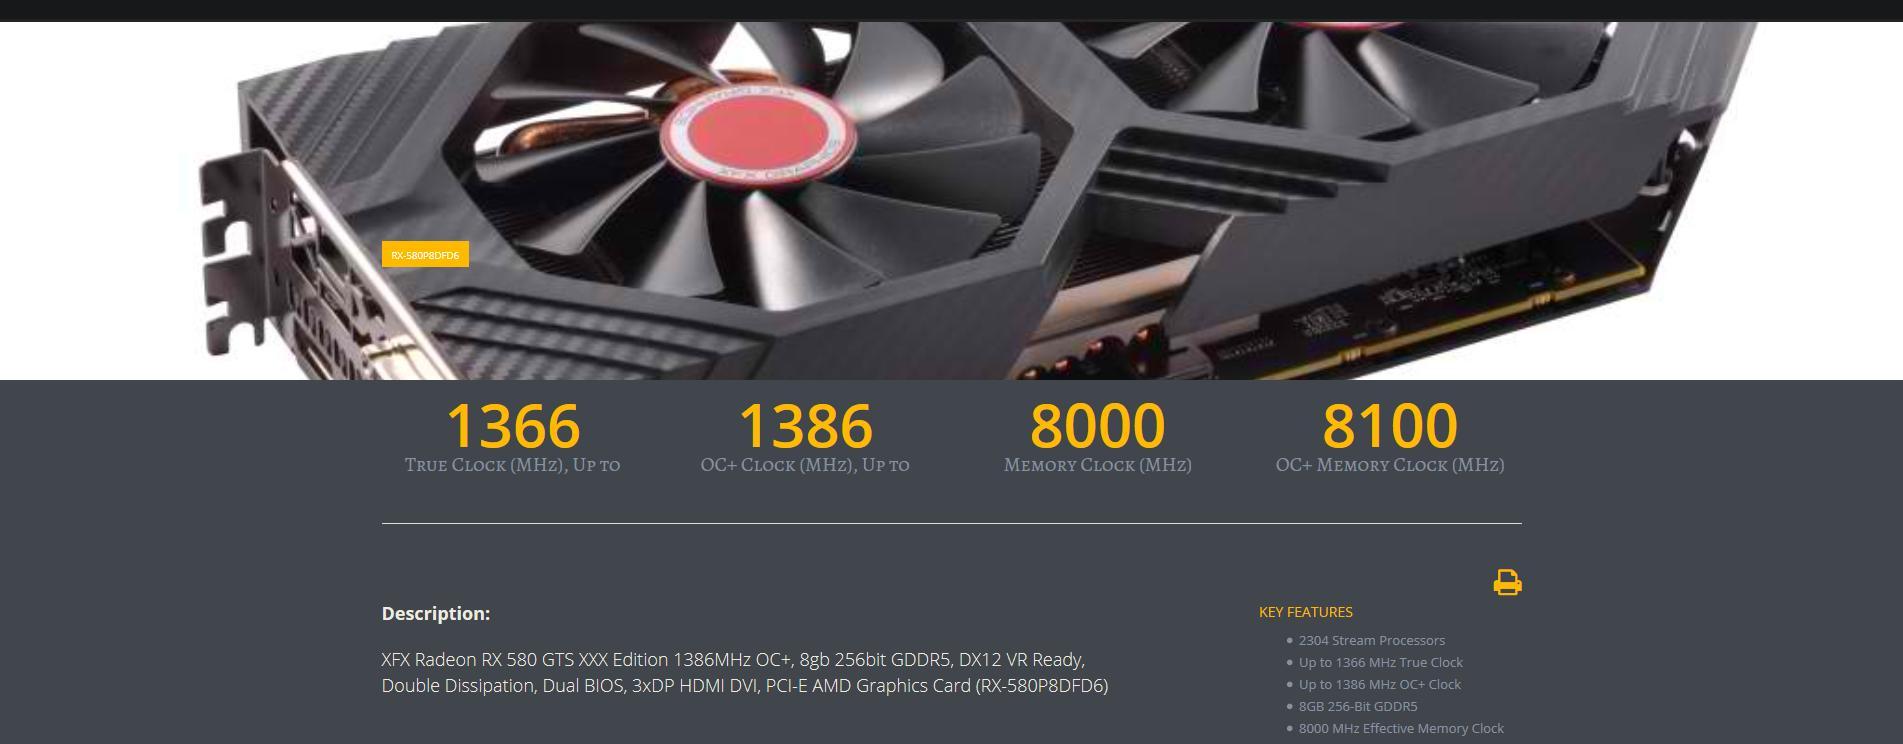 XFX RX580 8GB DDR5 GTS XXX Edition